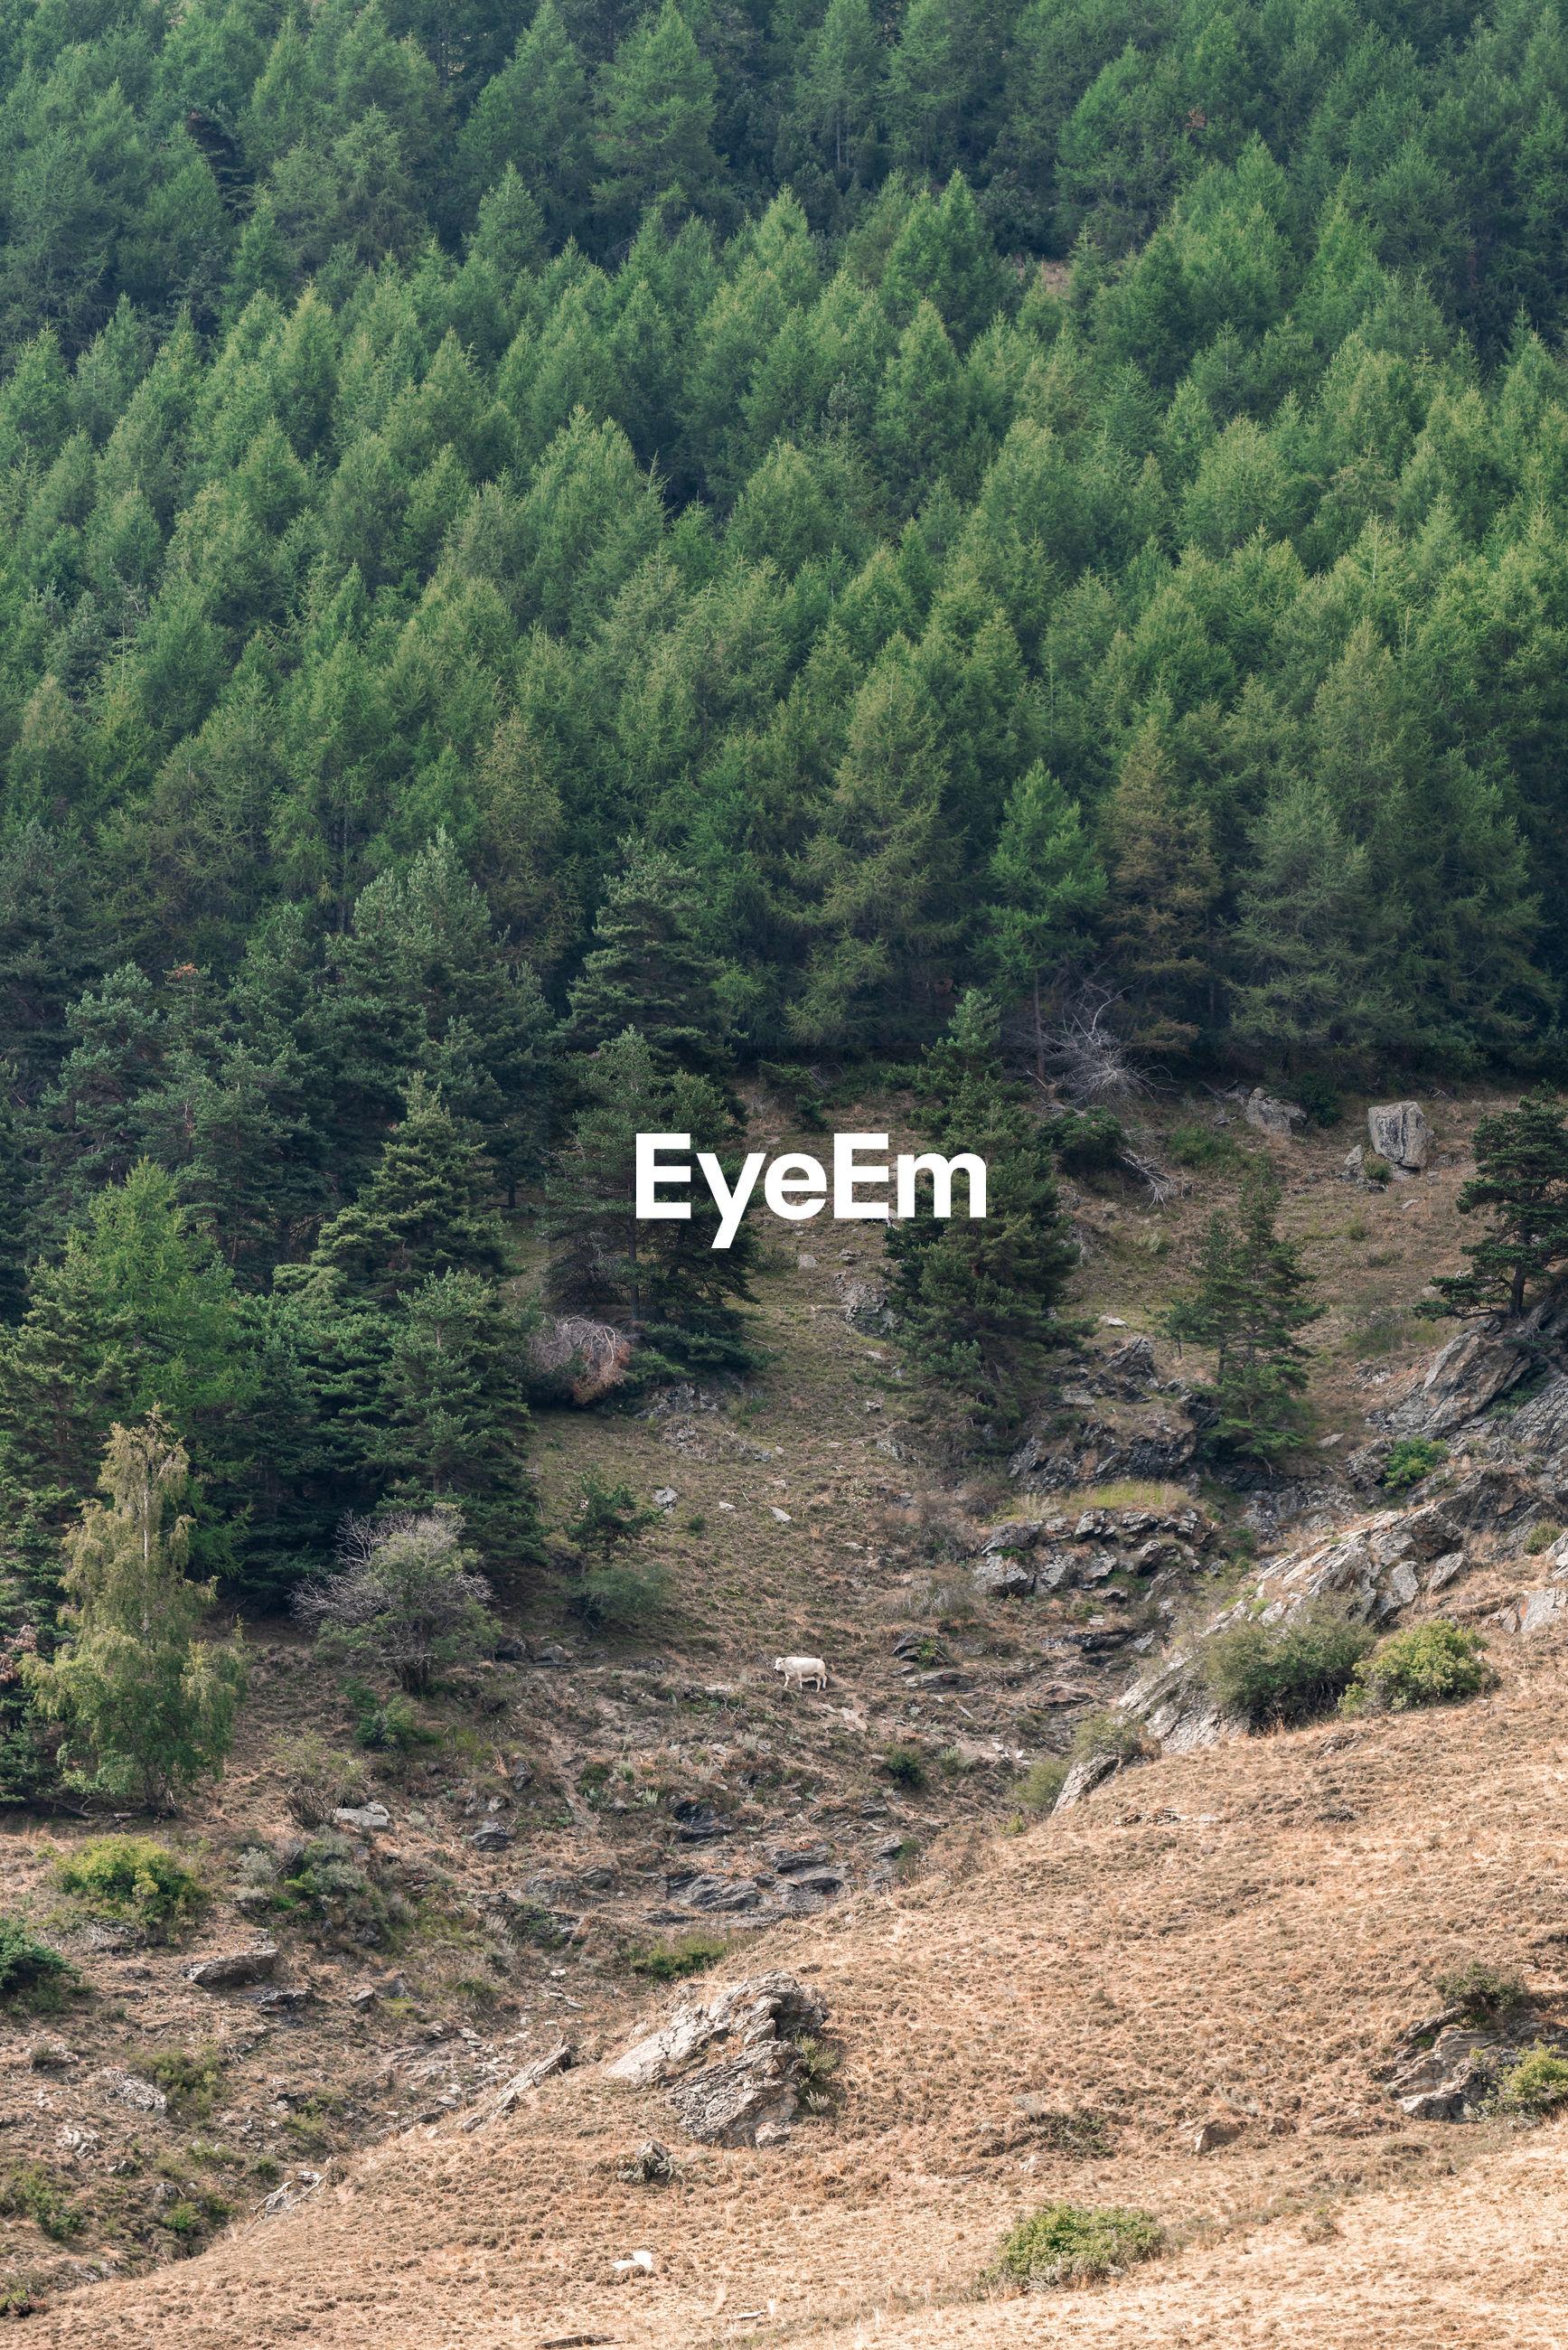 SCENIC VIEW OF PINE TREES